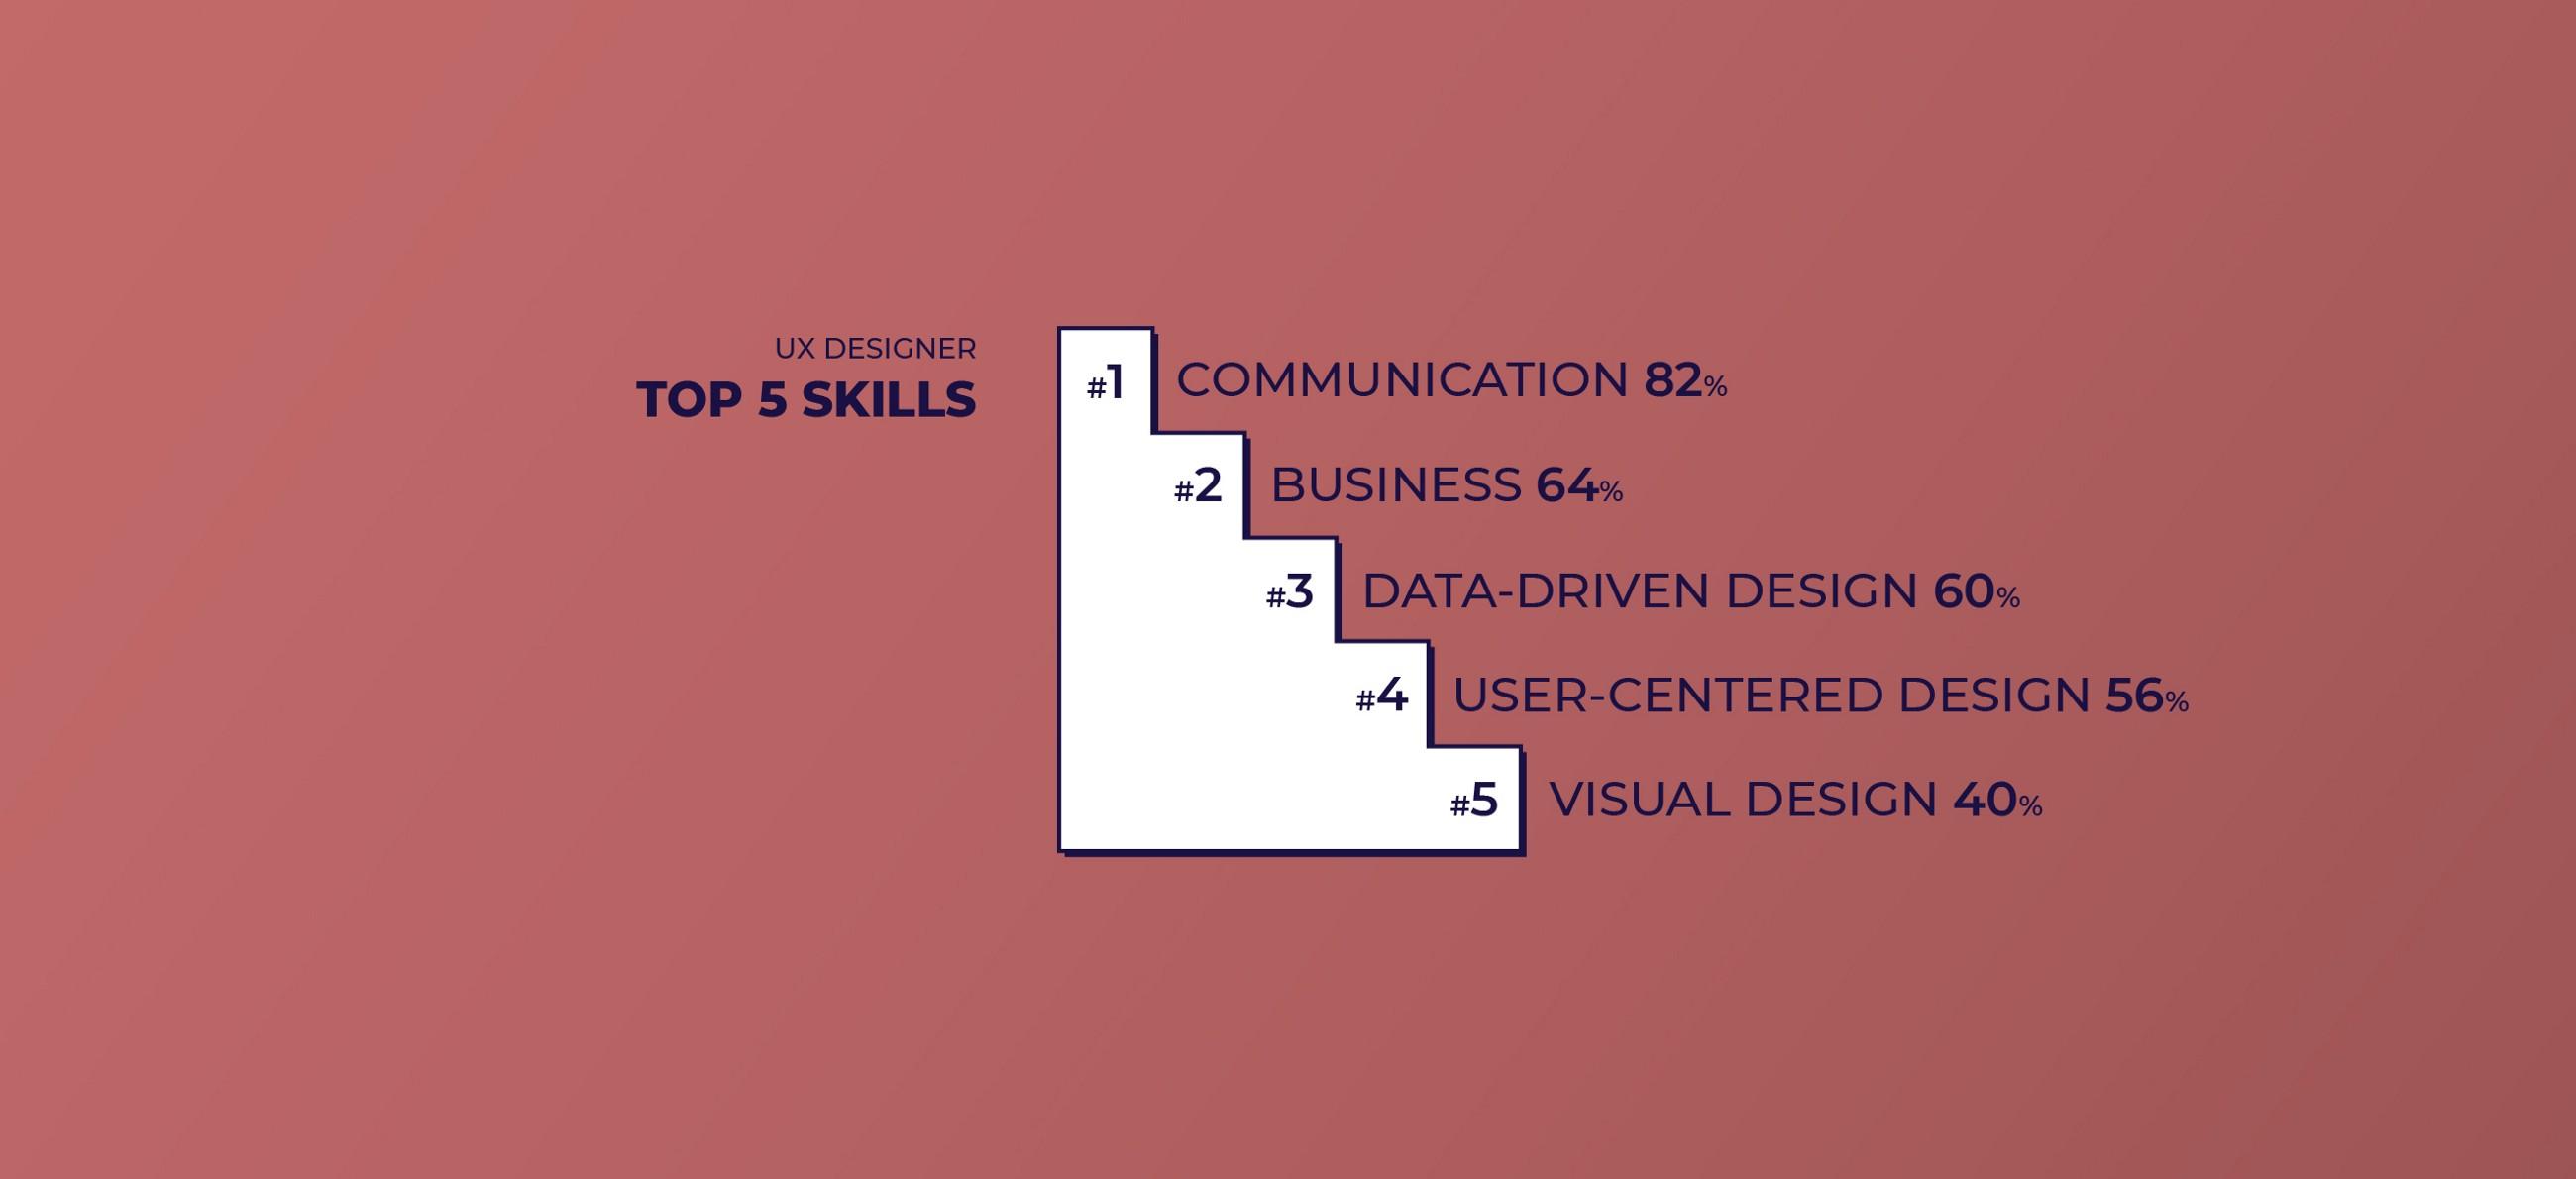 Top 5 Skills for UX Designers: Communication, Business, Data-driven design, User-centered design and Visual design